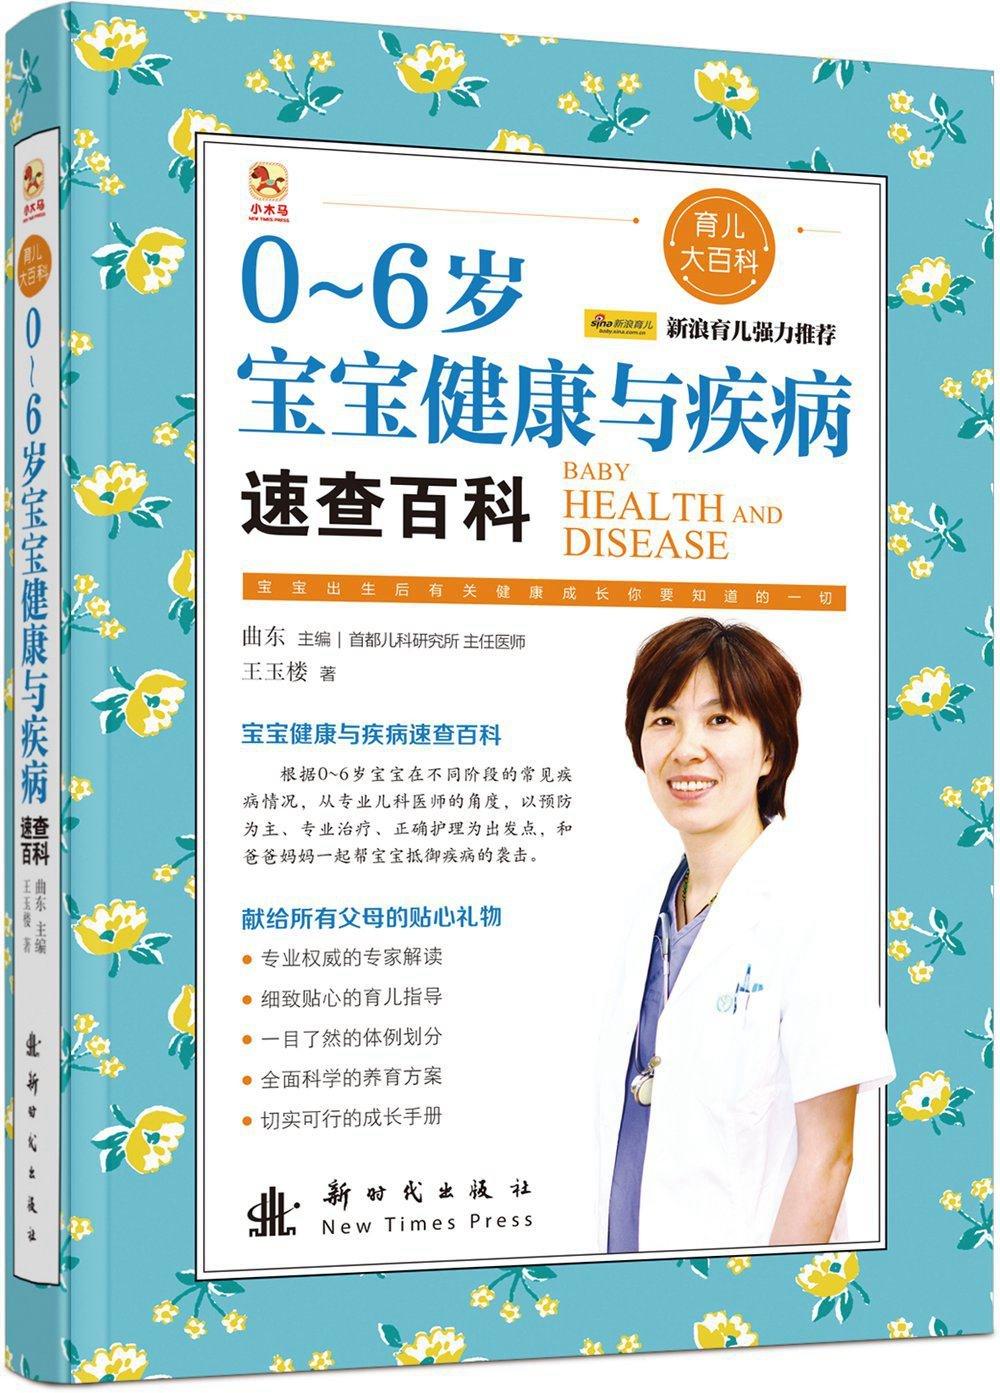 Read Online 0-6岁宝宝健康与疾病速查百科/育儿大百科 ebook